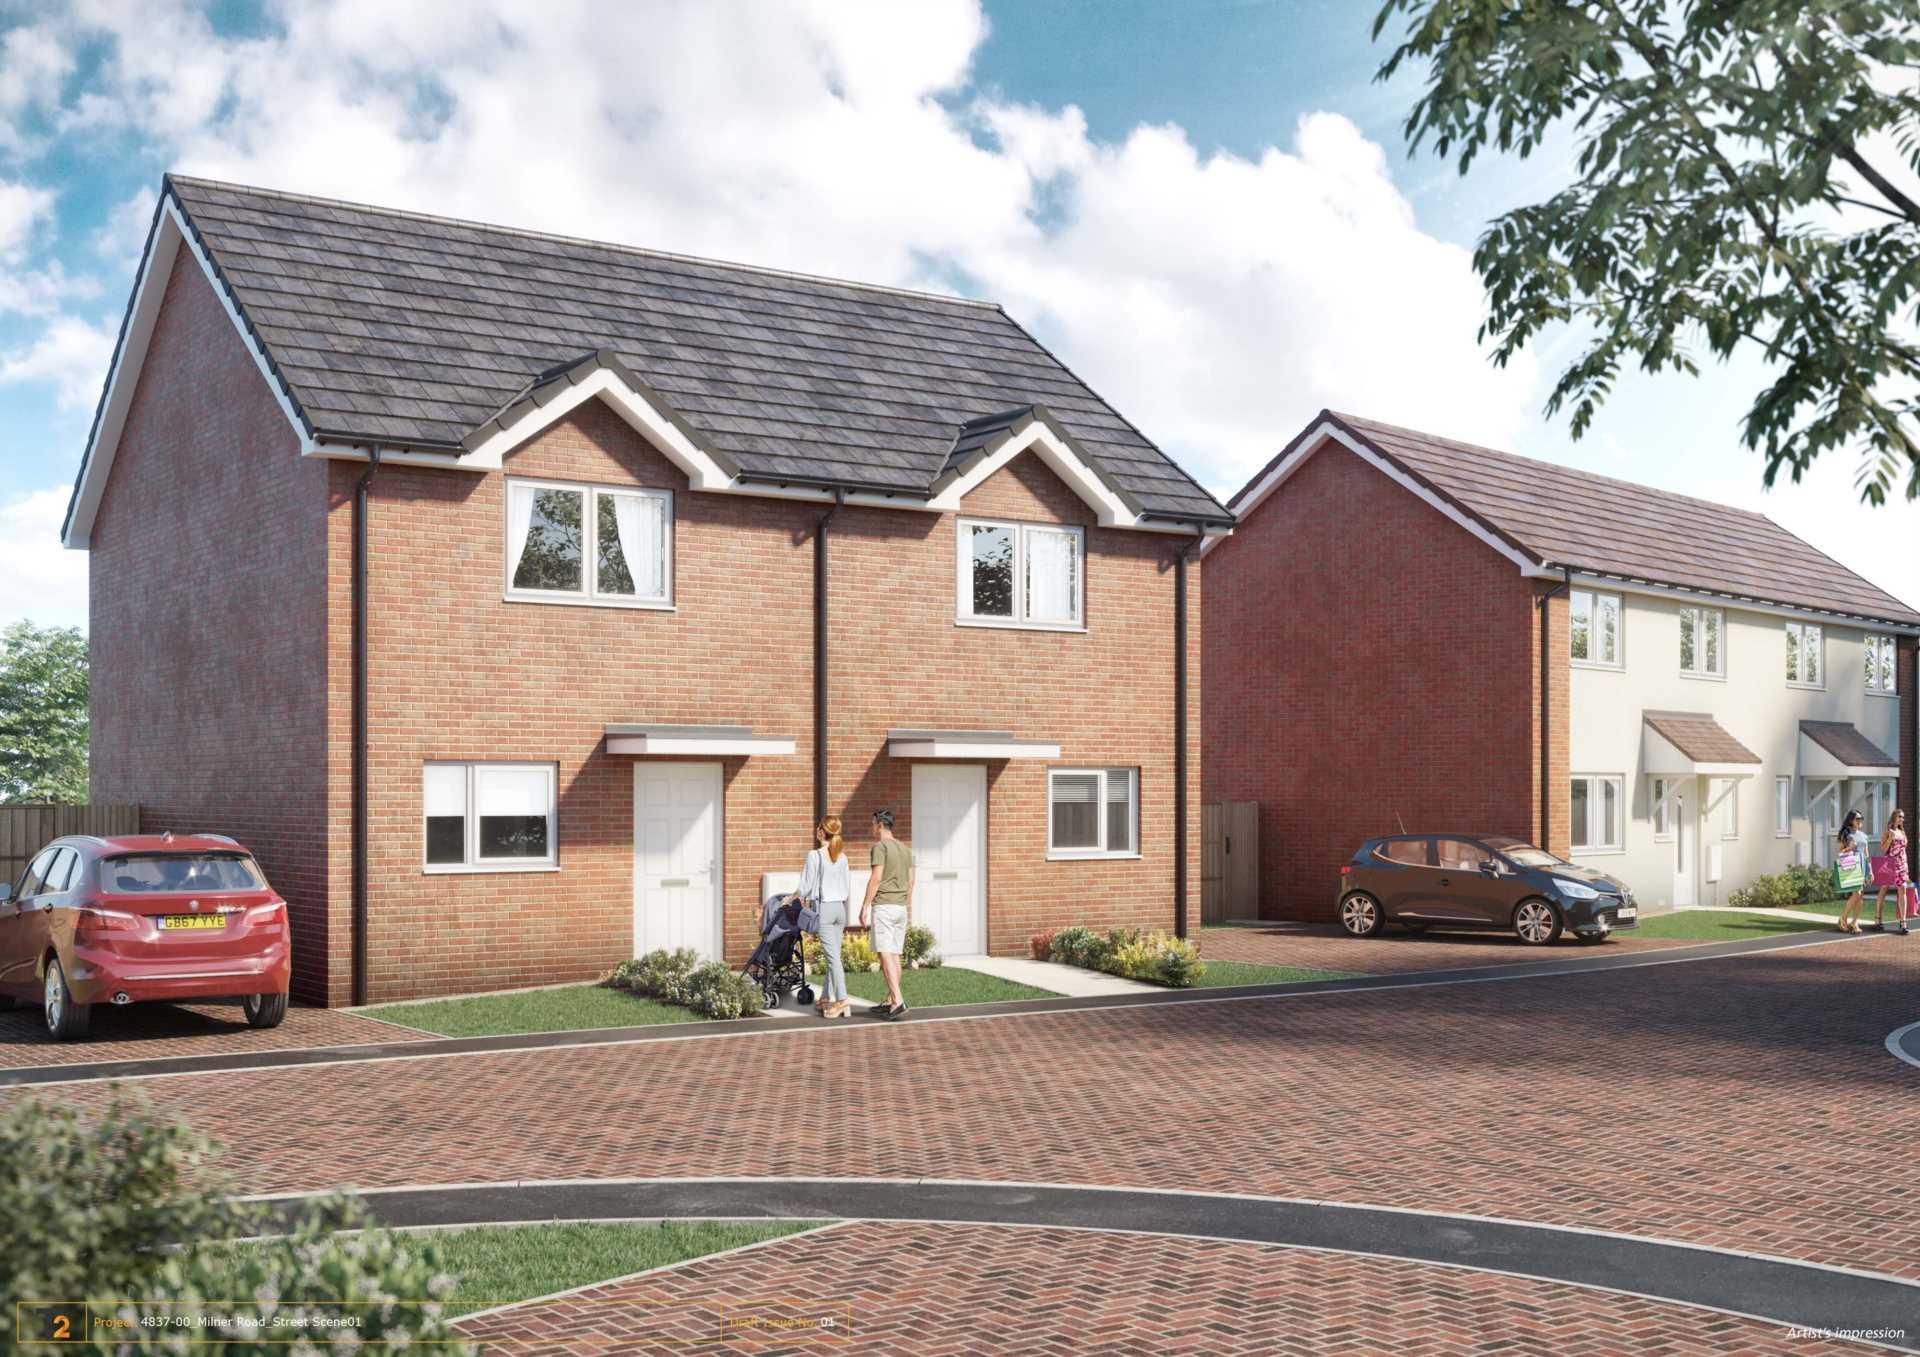 Finedon Fields - Rent To Buy & Market Rent